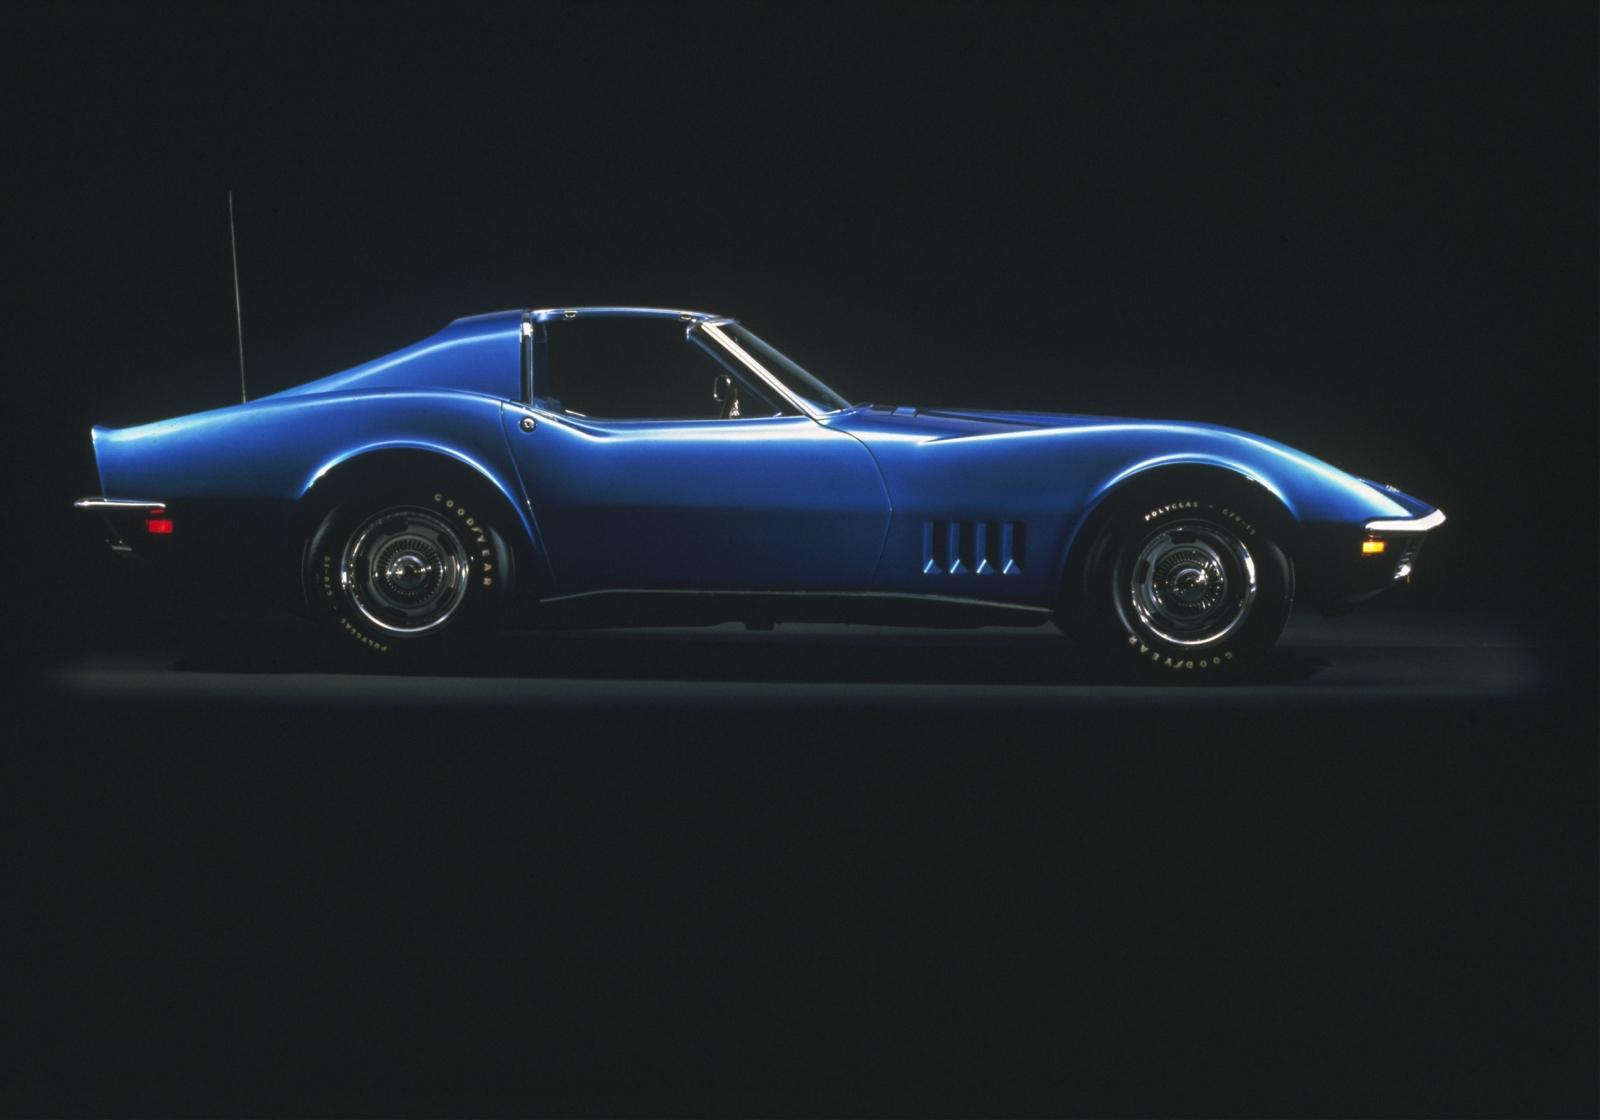 Corvette Stingray 1969 >> Corvette C3 Wallpaper - WallpaperSafari